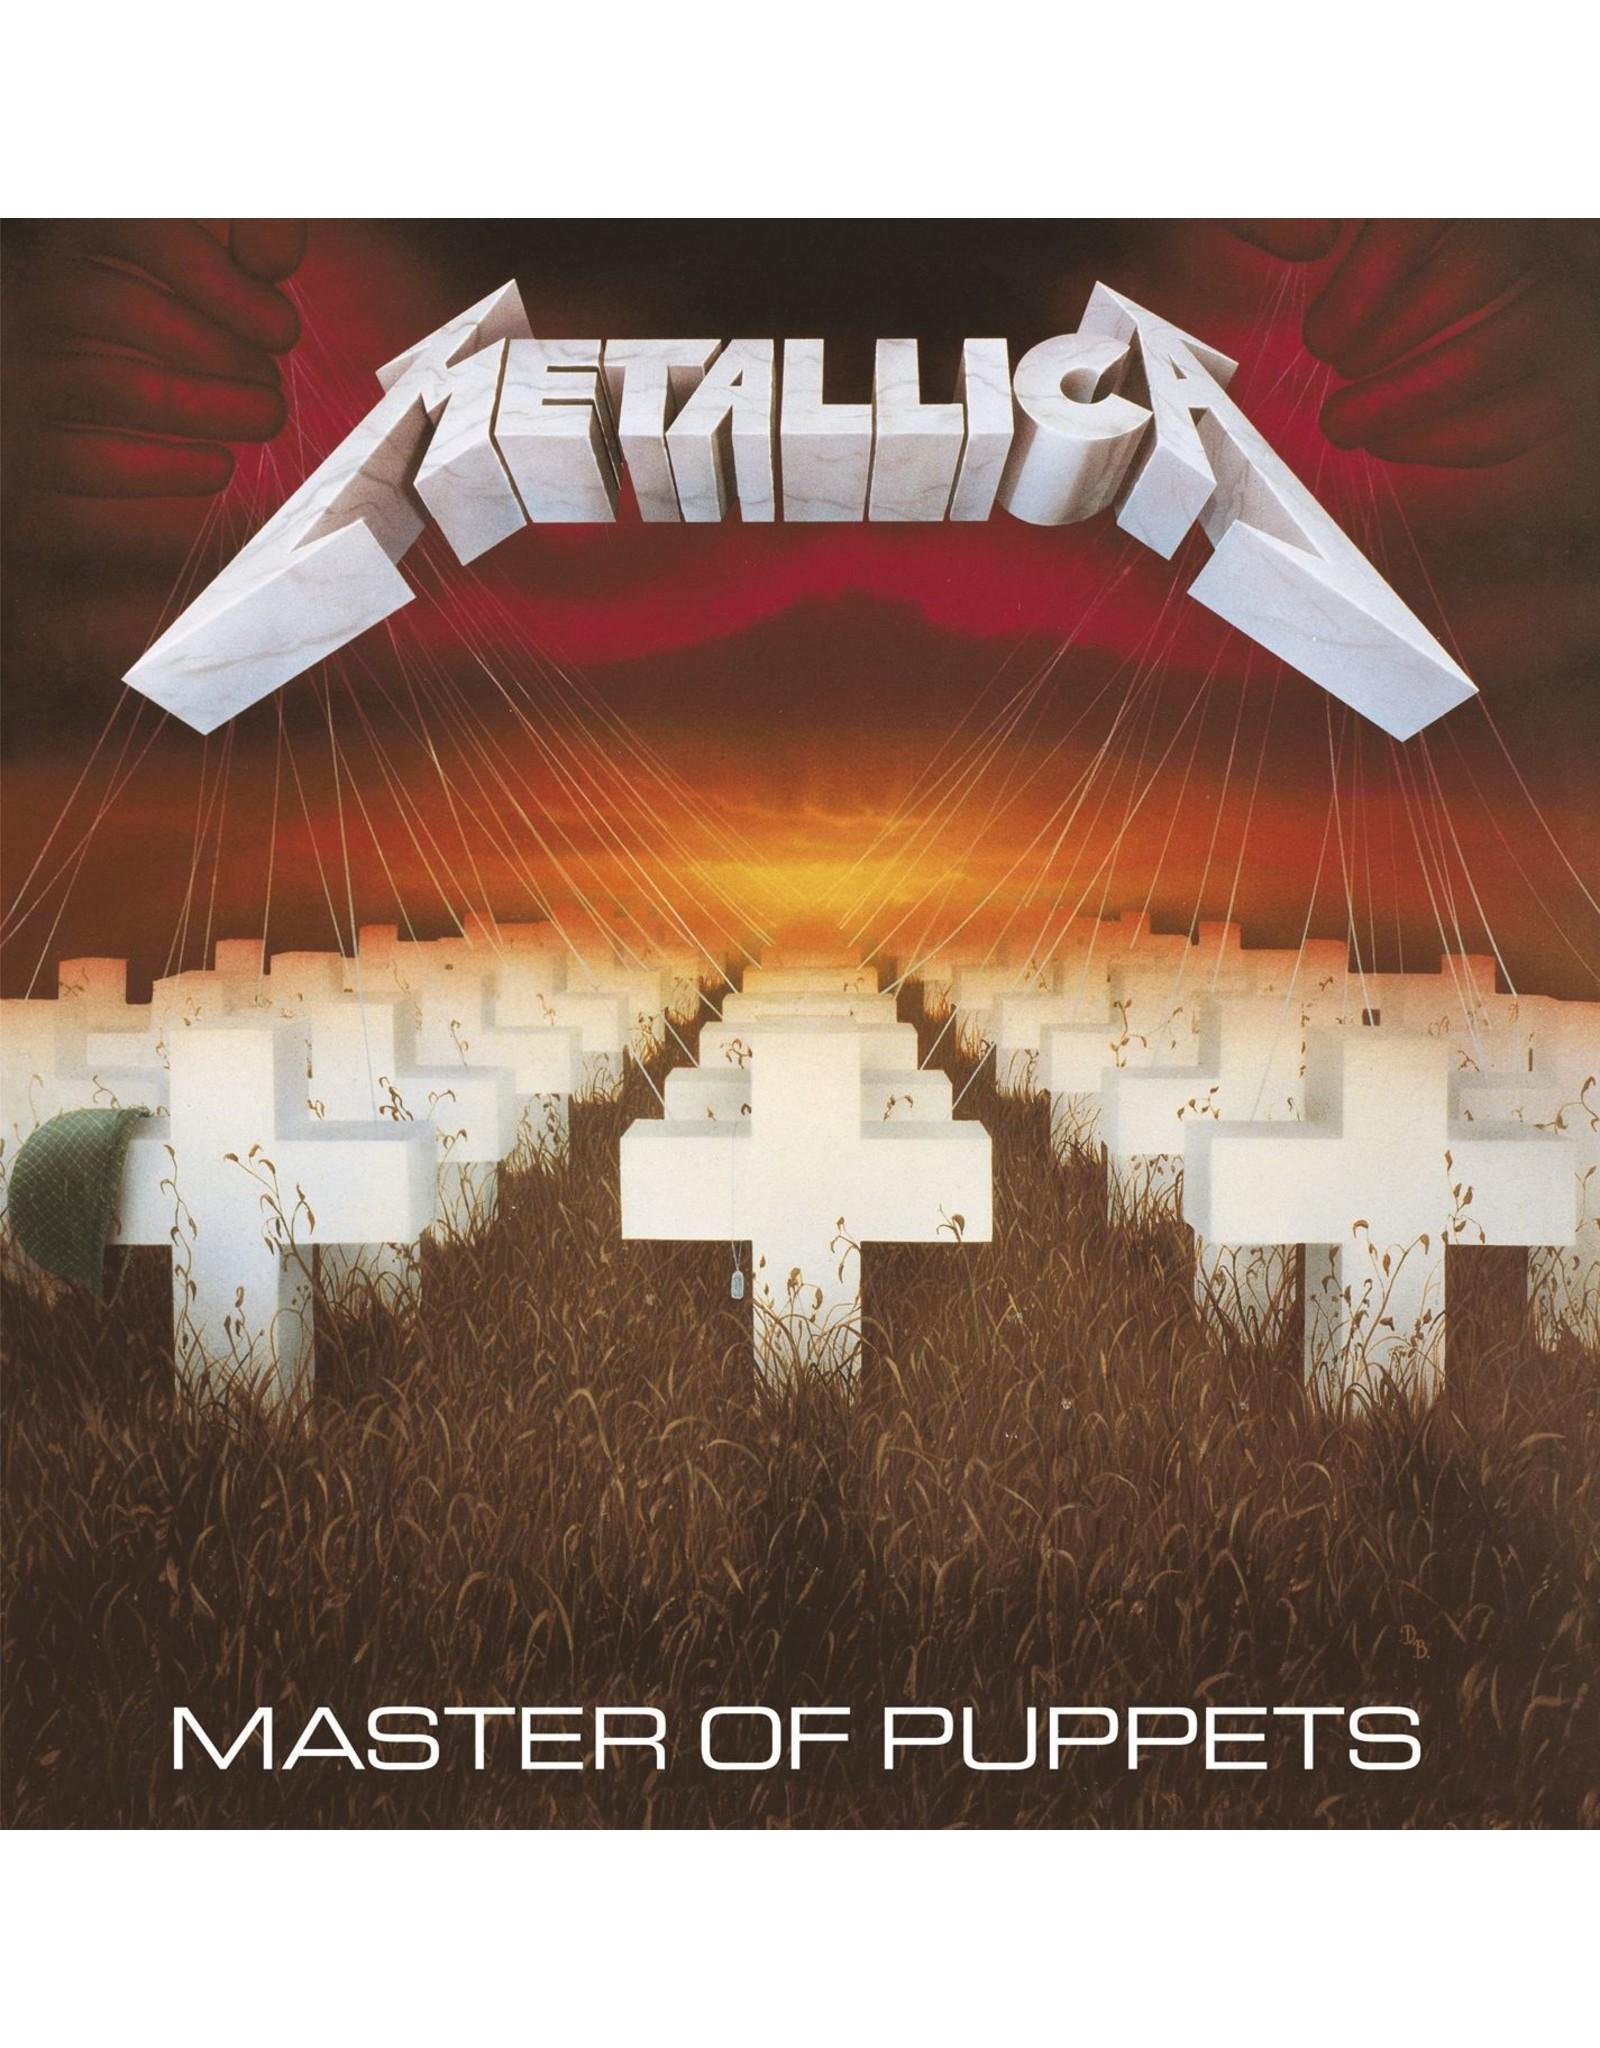 New Vinyl Metallica - Master Of Puppets (2017 Remaster) LP